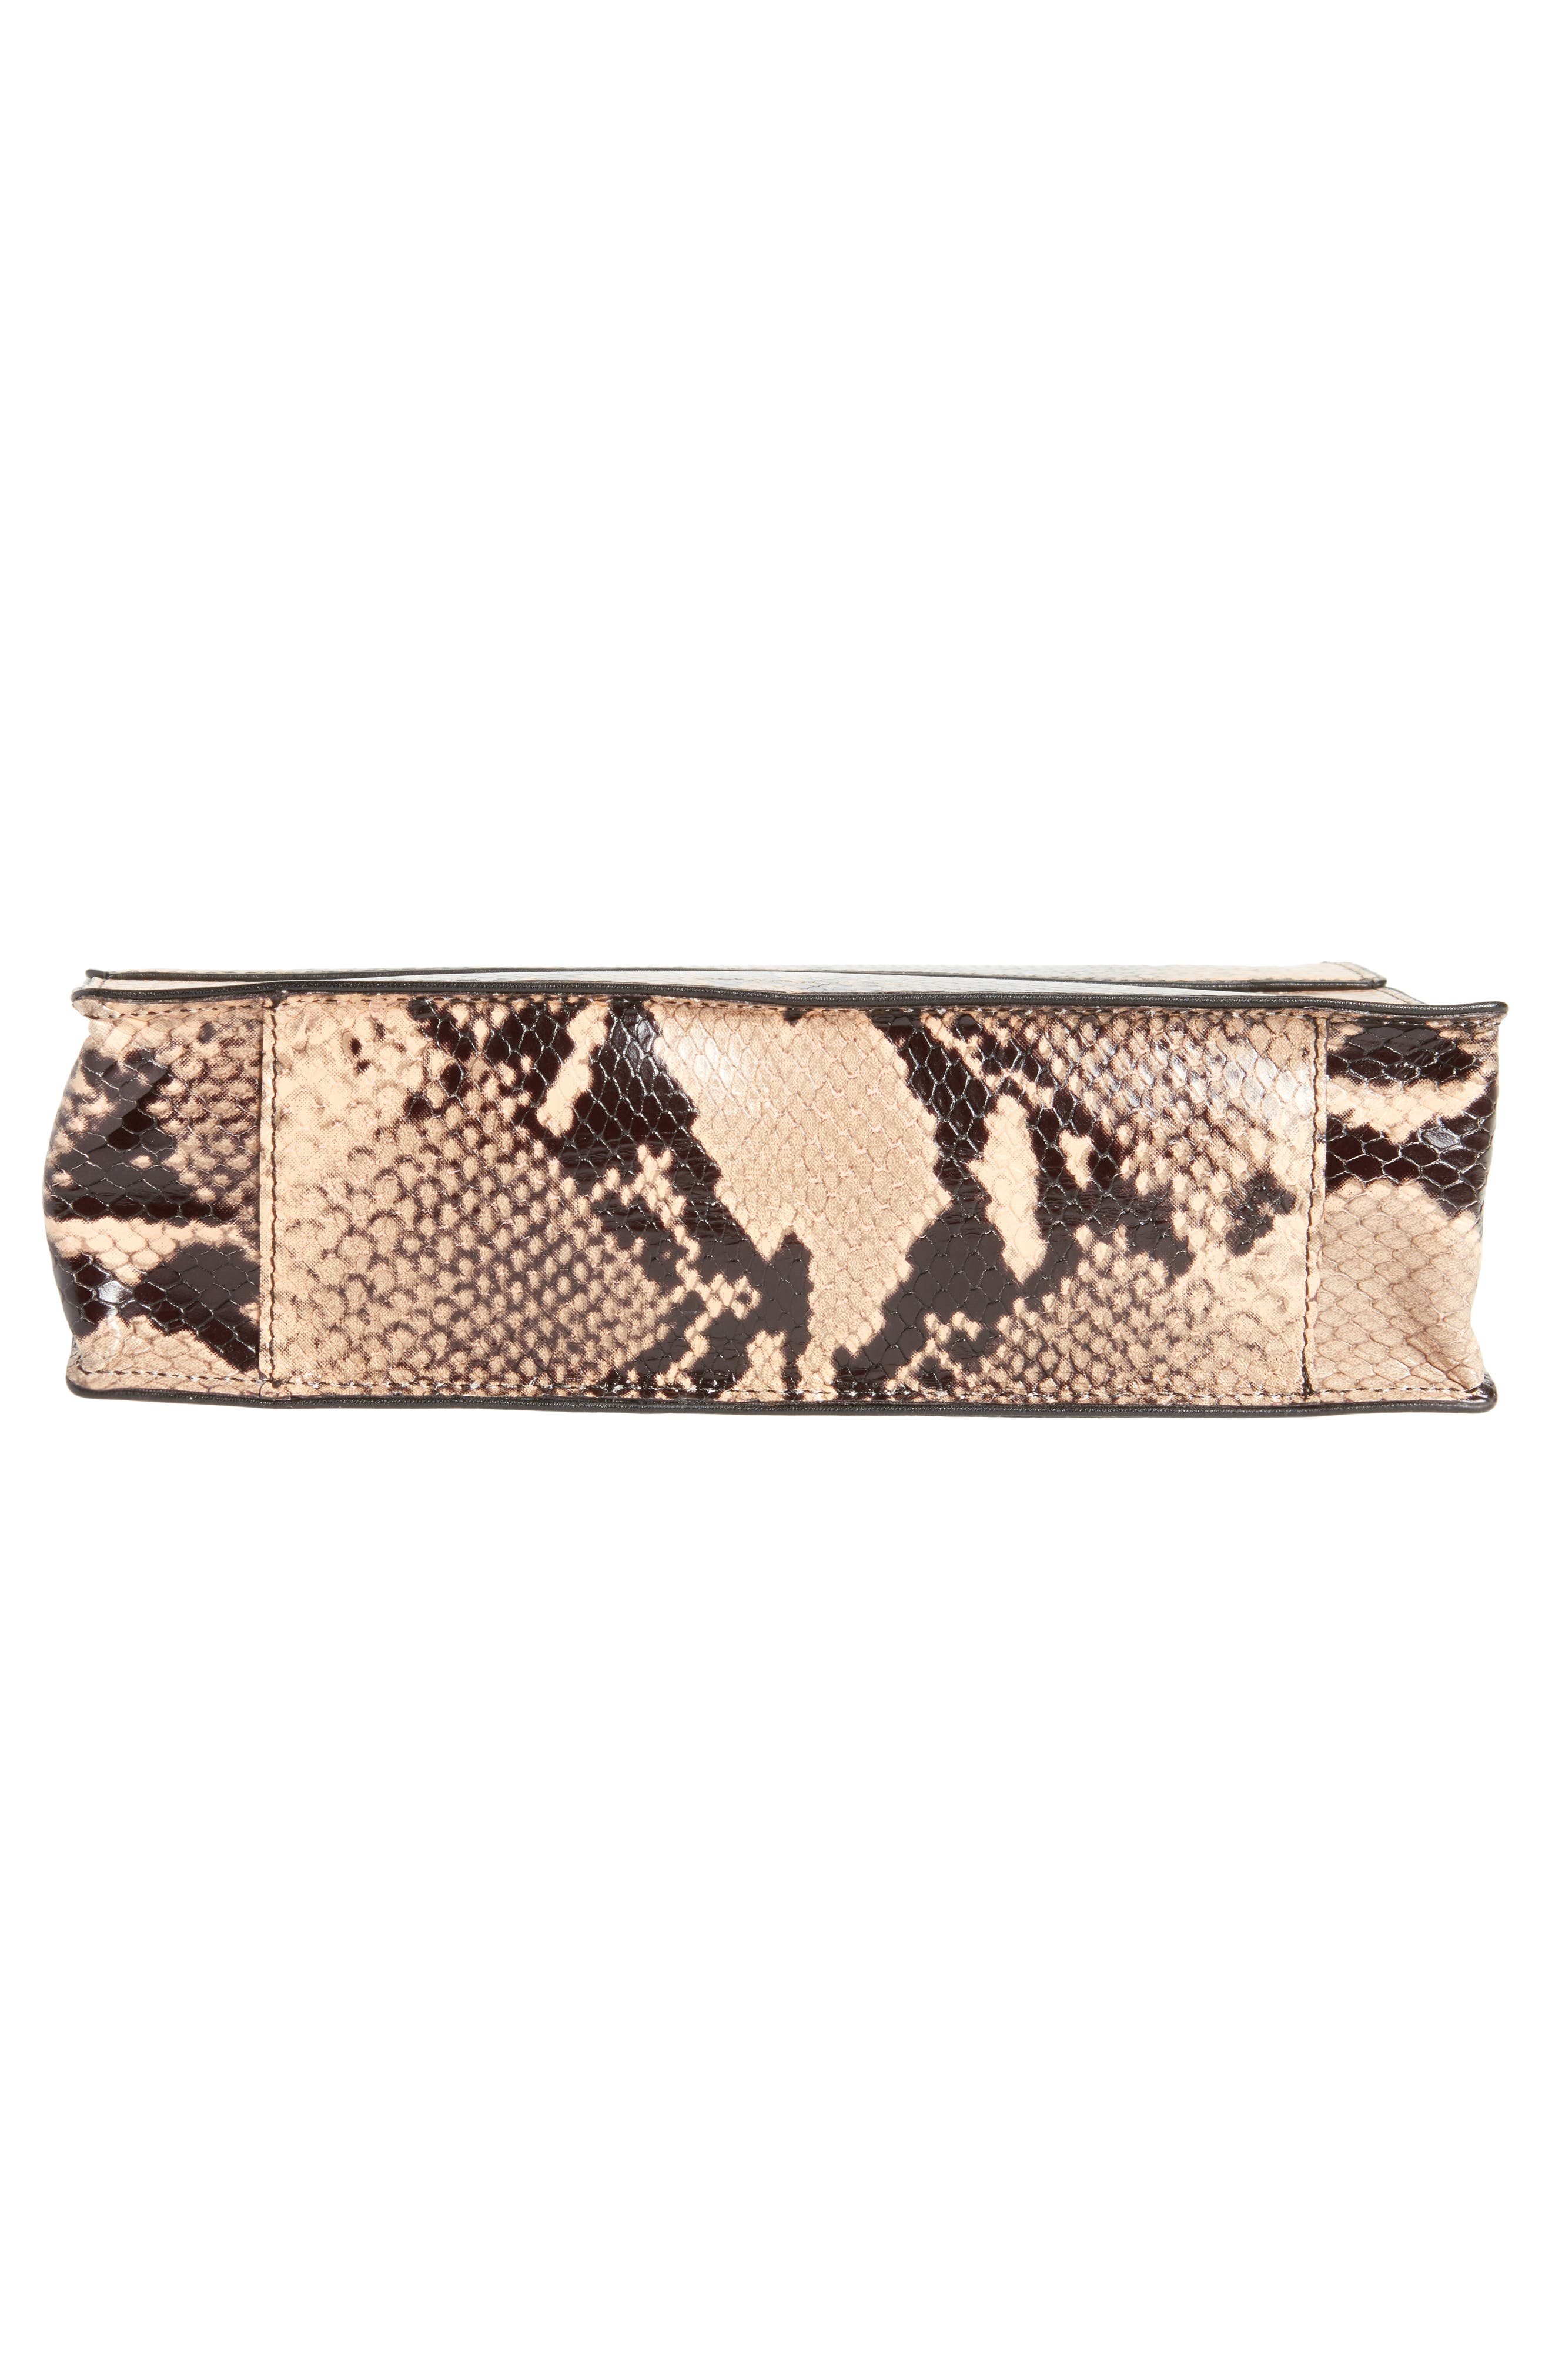 Snake Embossed Leather Wristlet Clutch,                             Alternate thumbnail 6, color,                             Camel